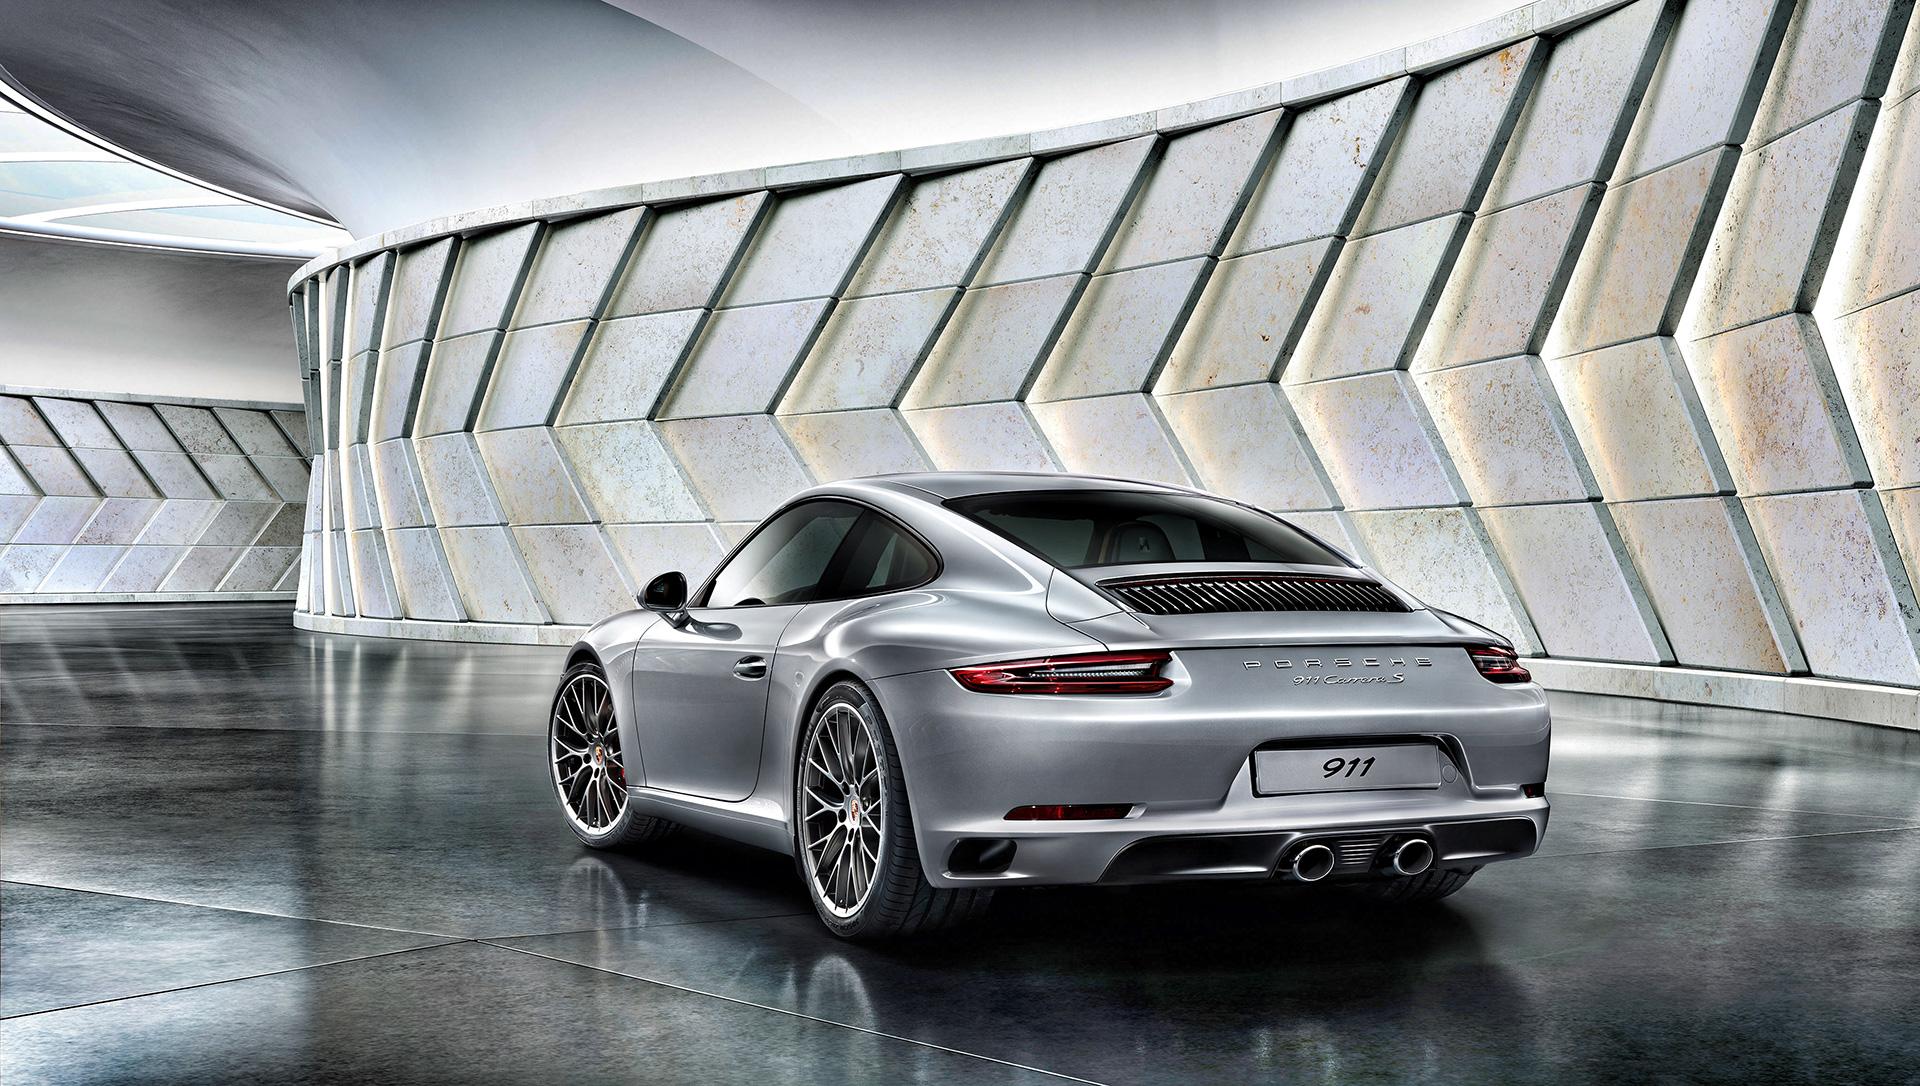 Porsche 911 II